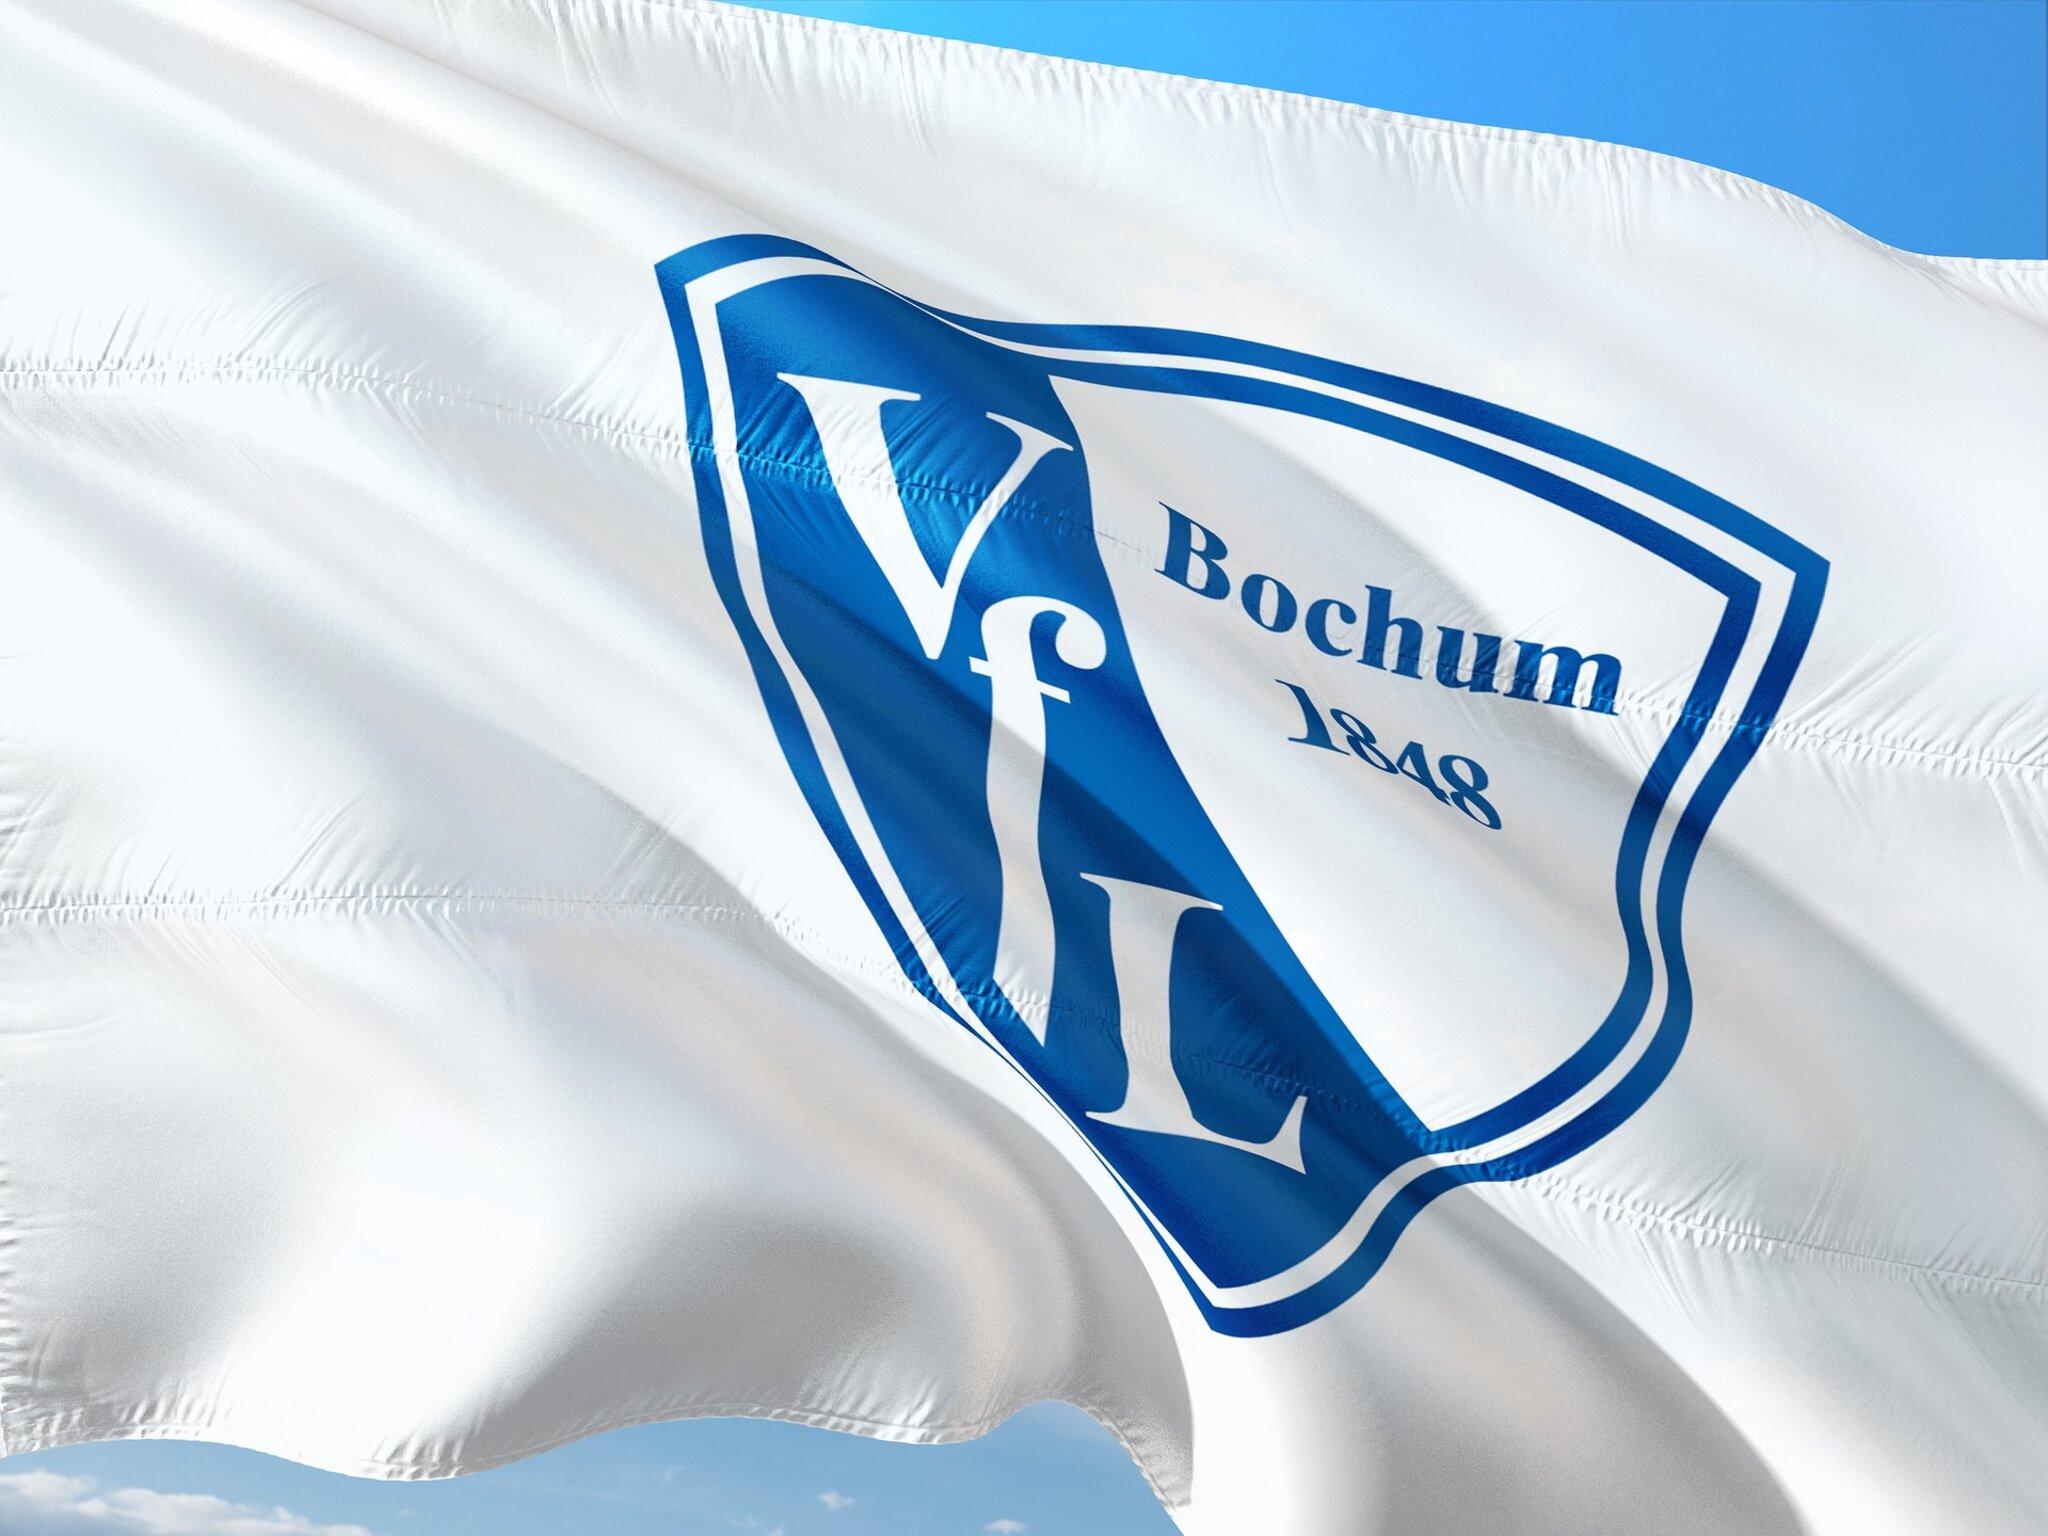 Vfl Bochum Forum